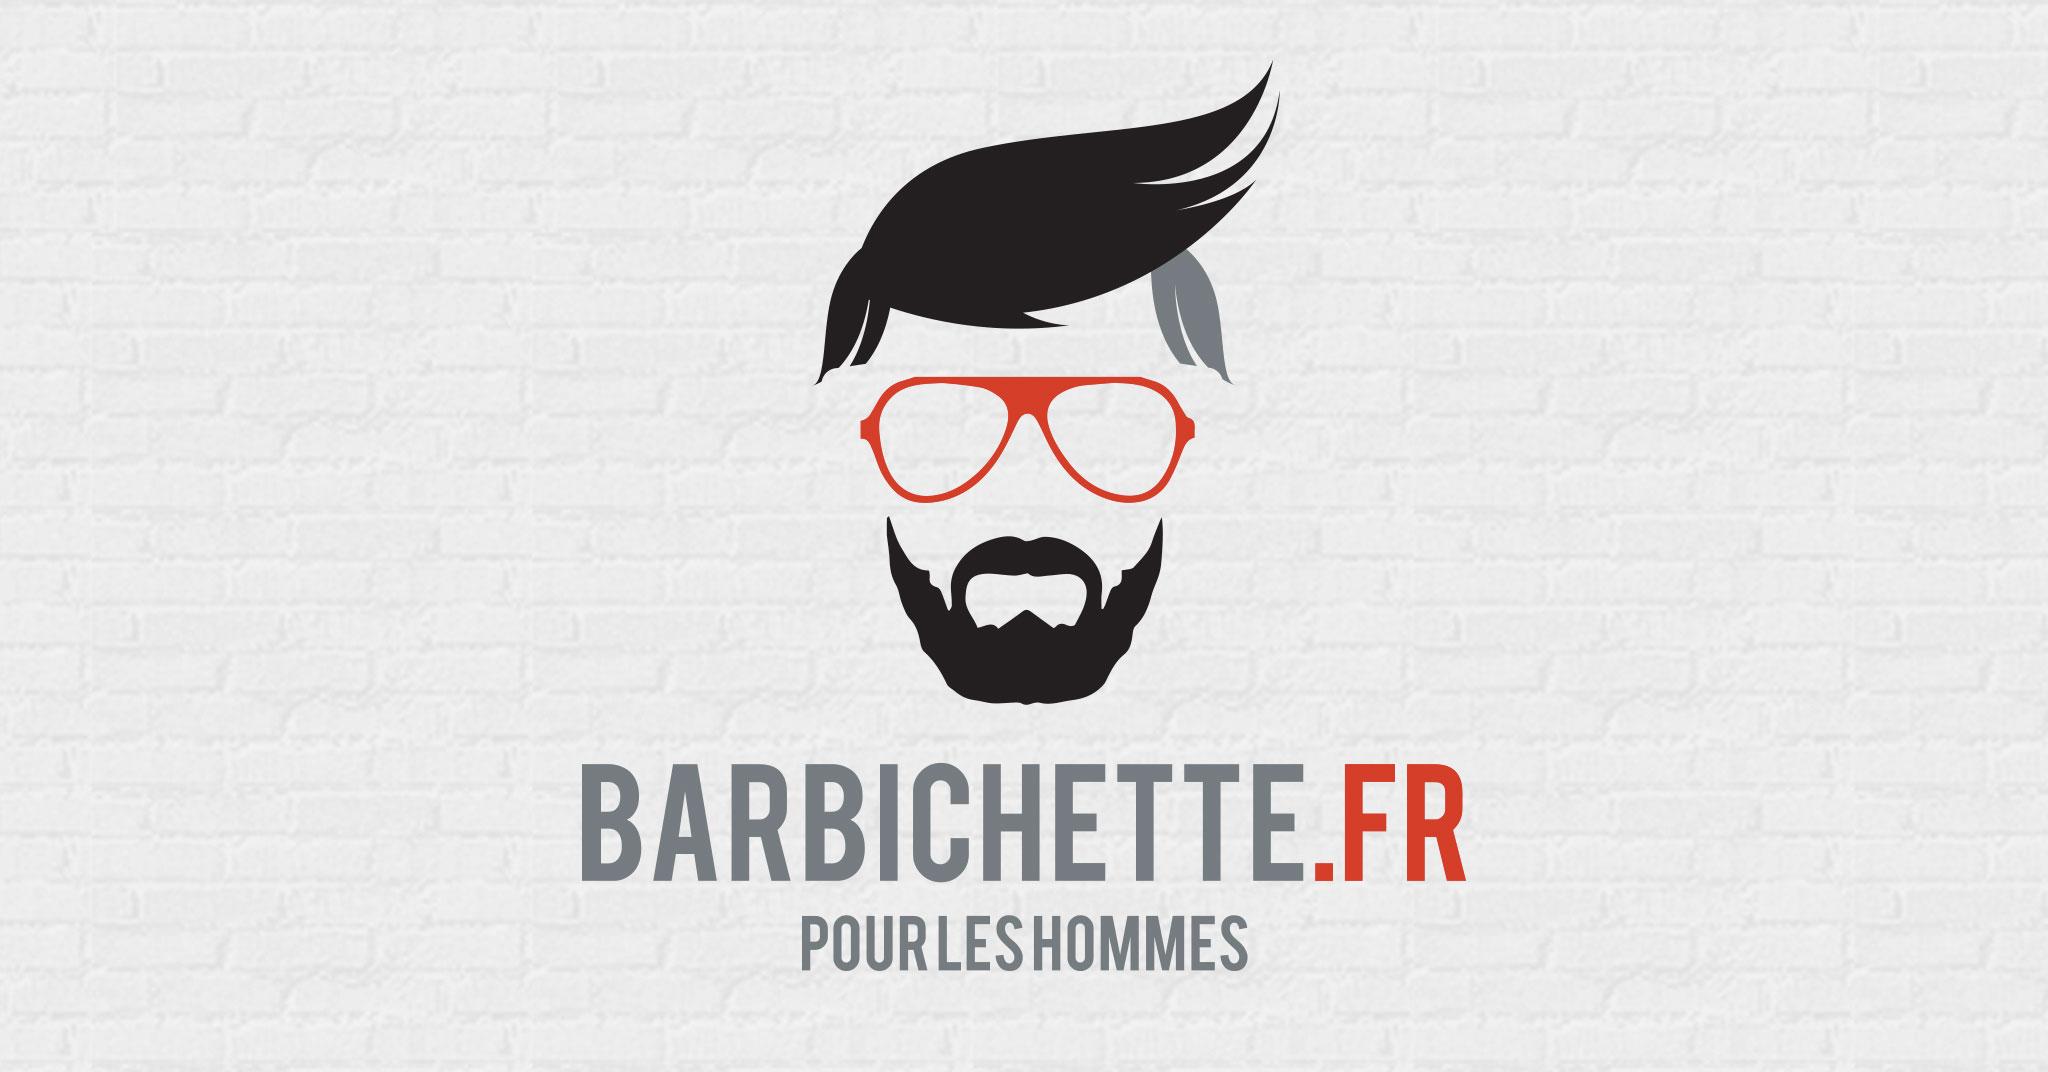 (c) Barbichette.fr